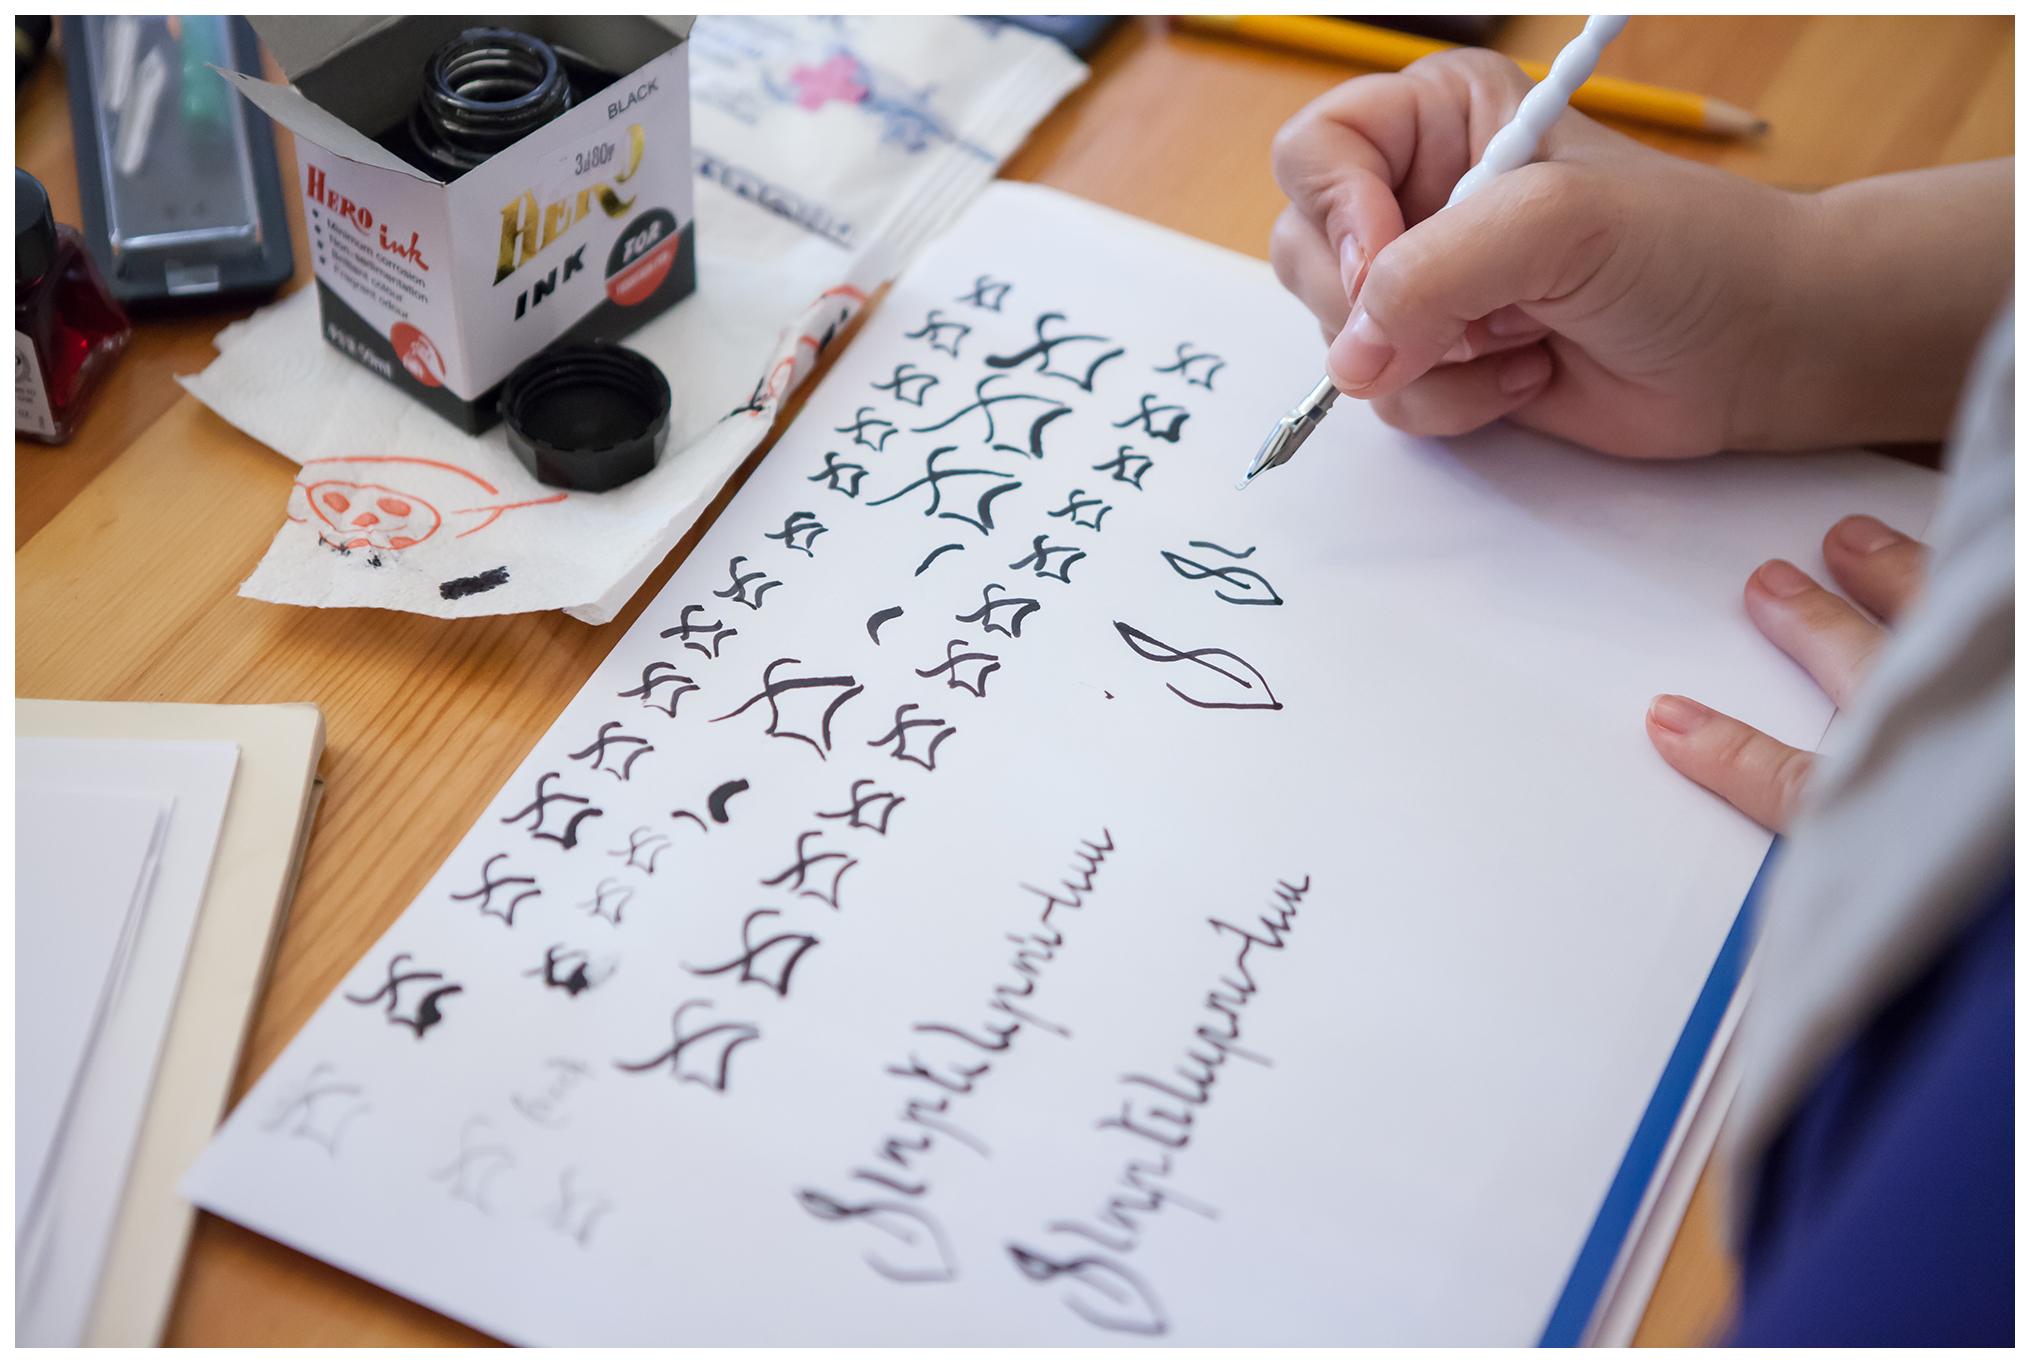 Zdjęcie ukazuje dłonie innej kobiety, która nanosi litery na papier za pomocą pióra.